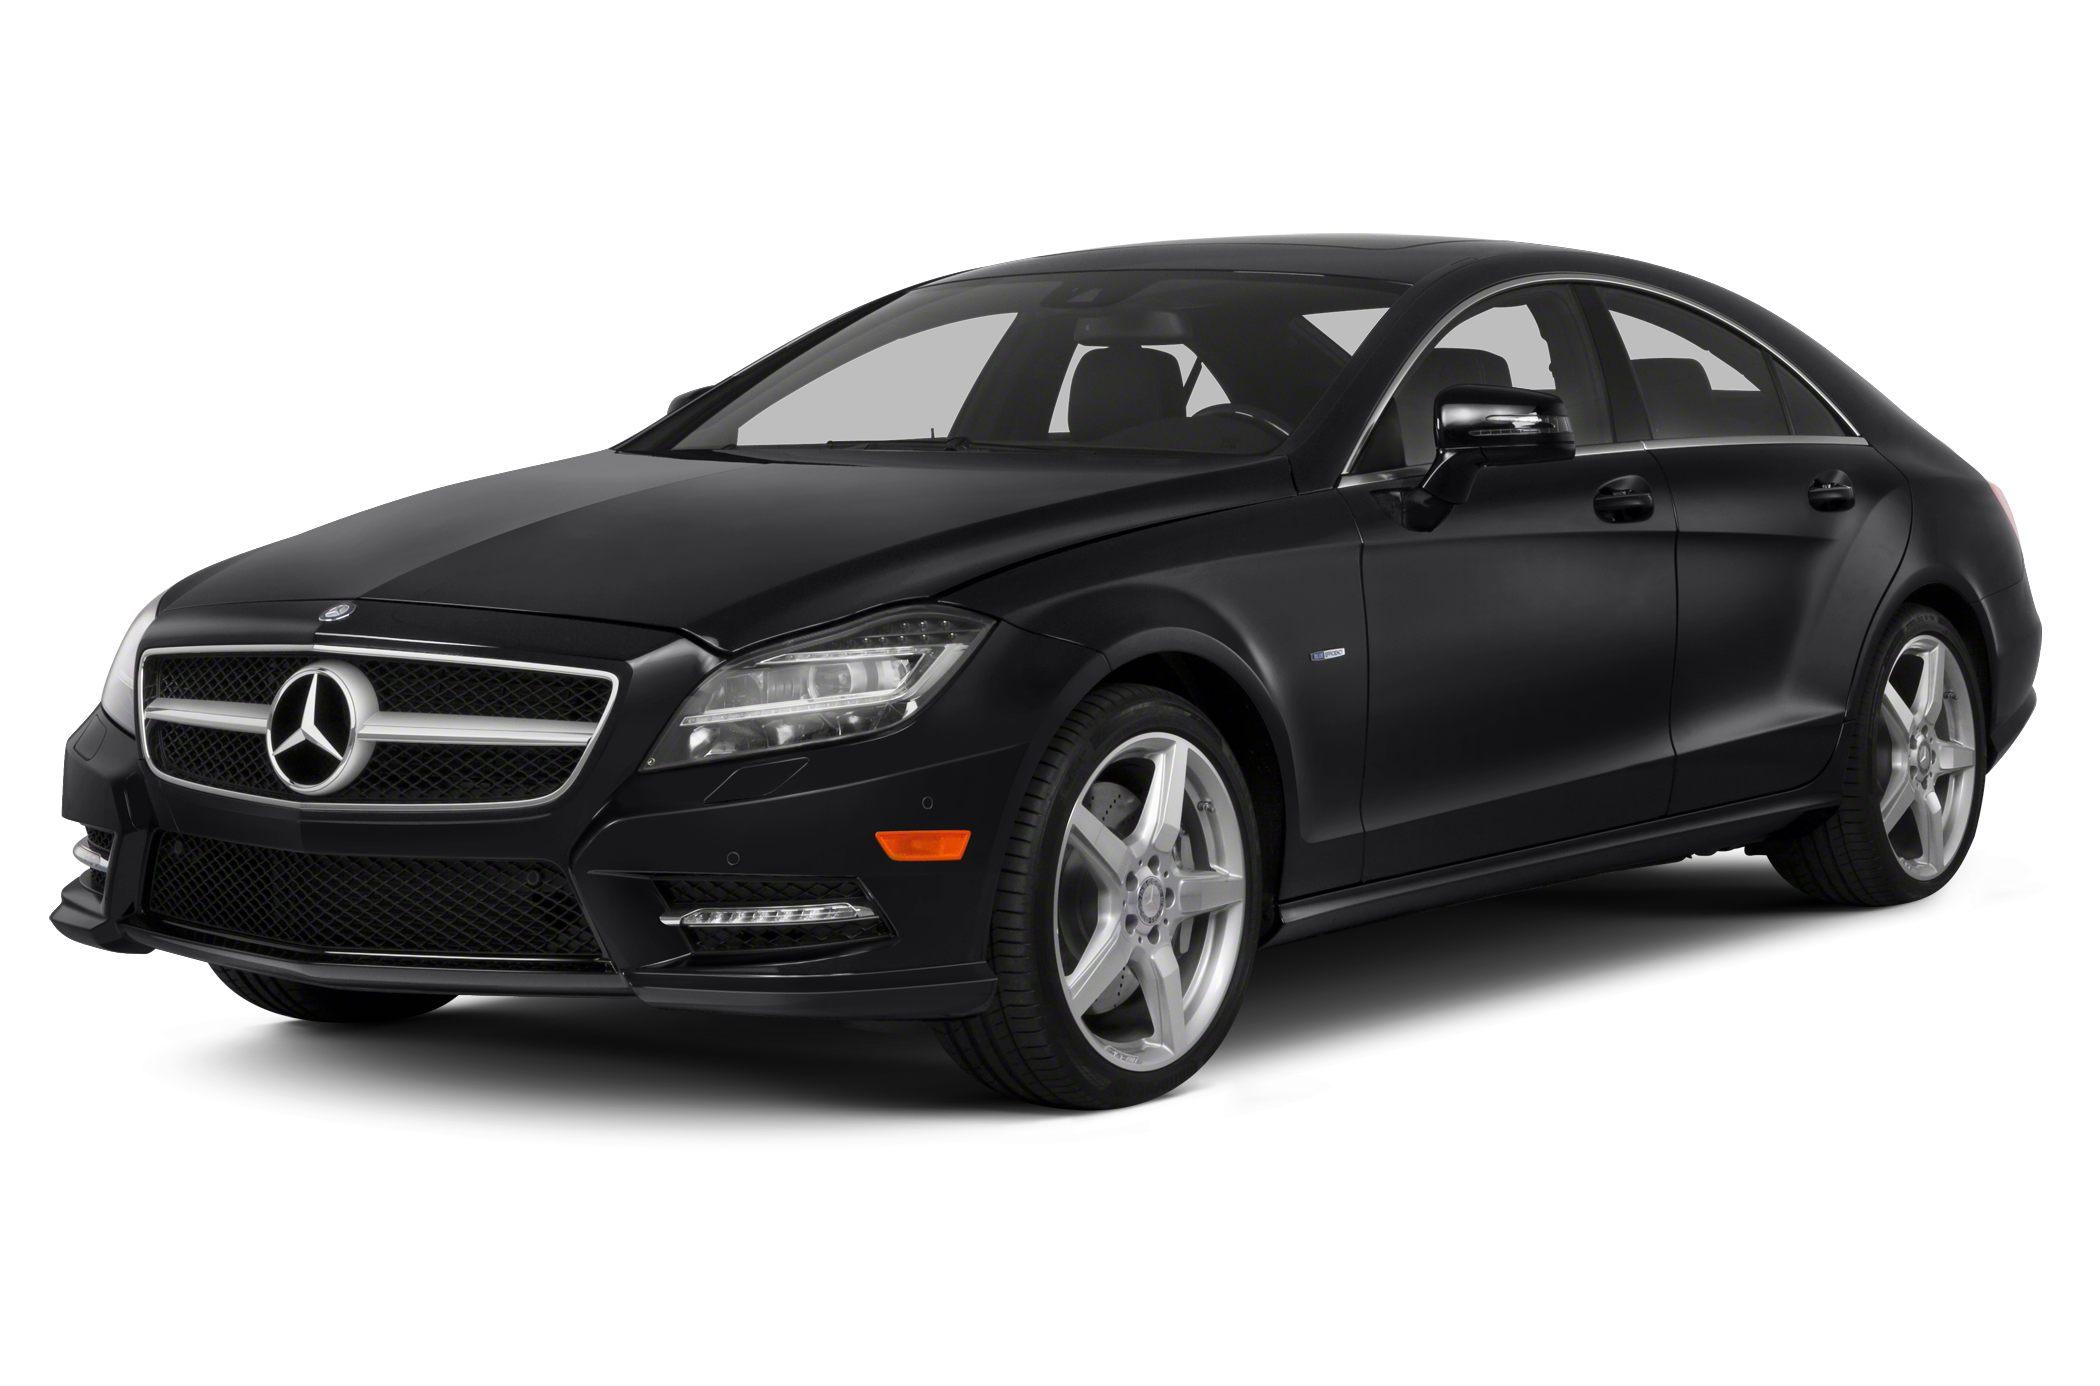 2013 Mercedes Benz CLS Class Safety Features